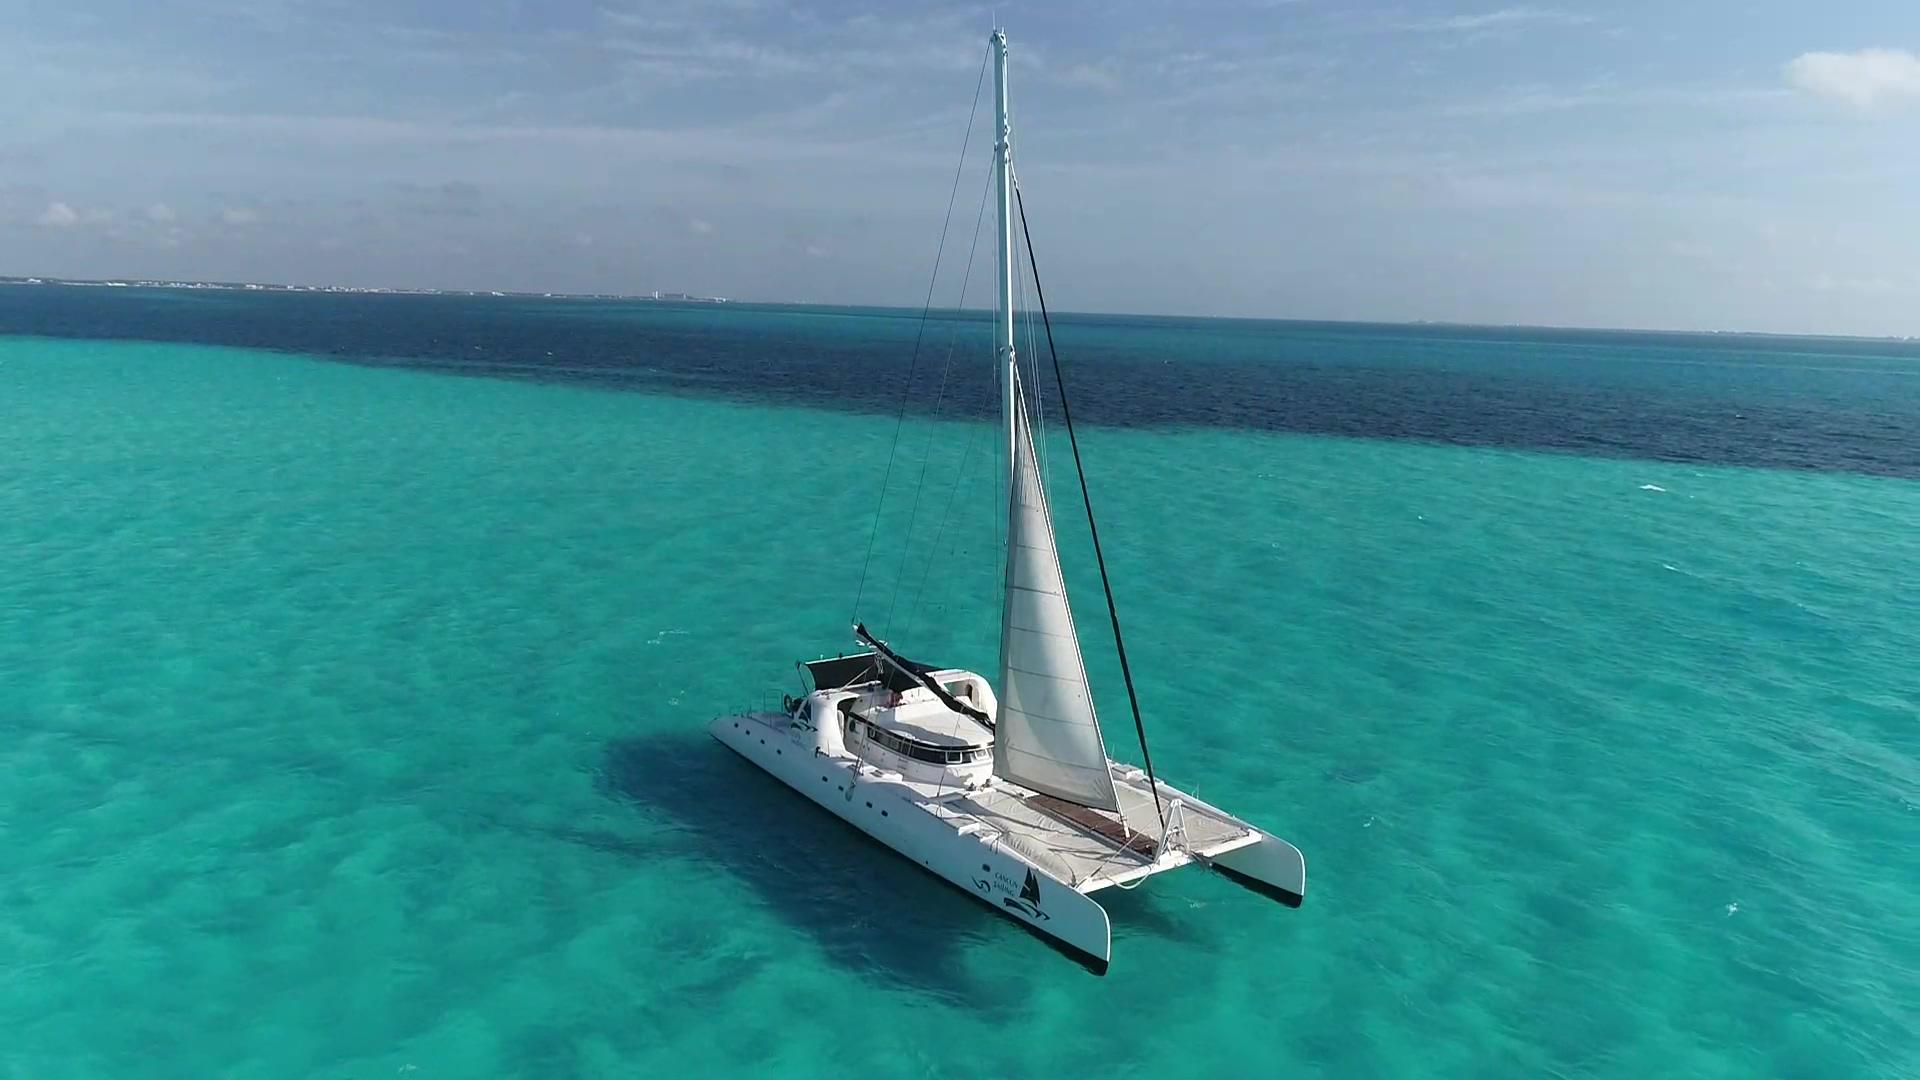 Catamaran Amazing - Video